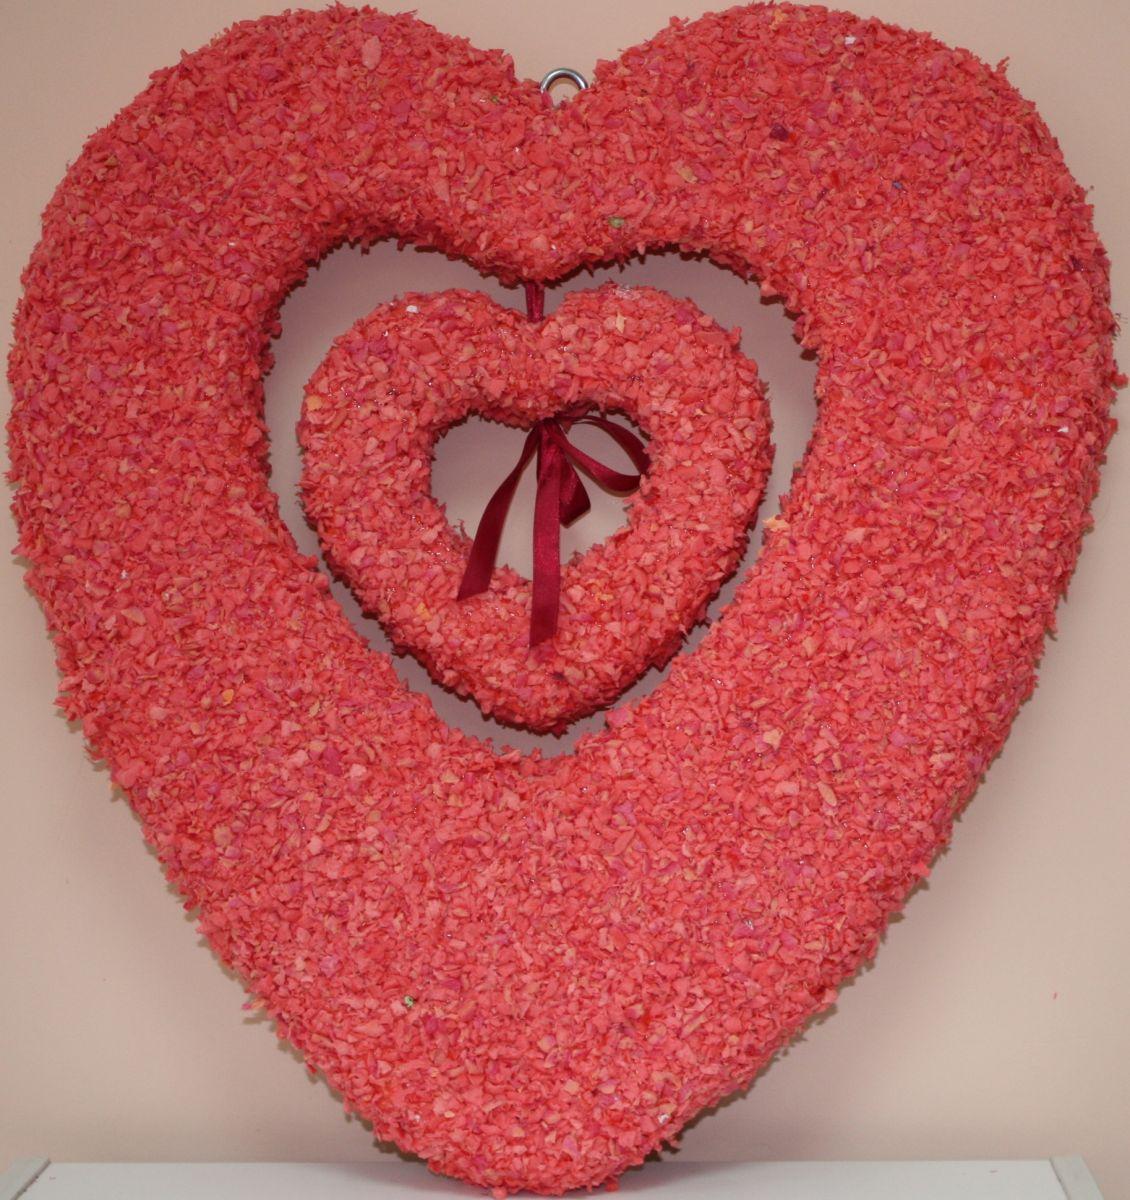 Производство сердец на любой вкус